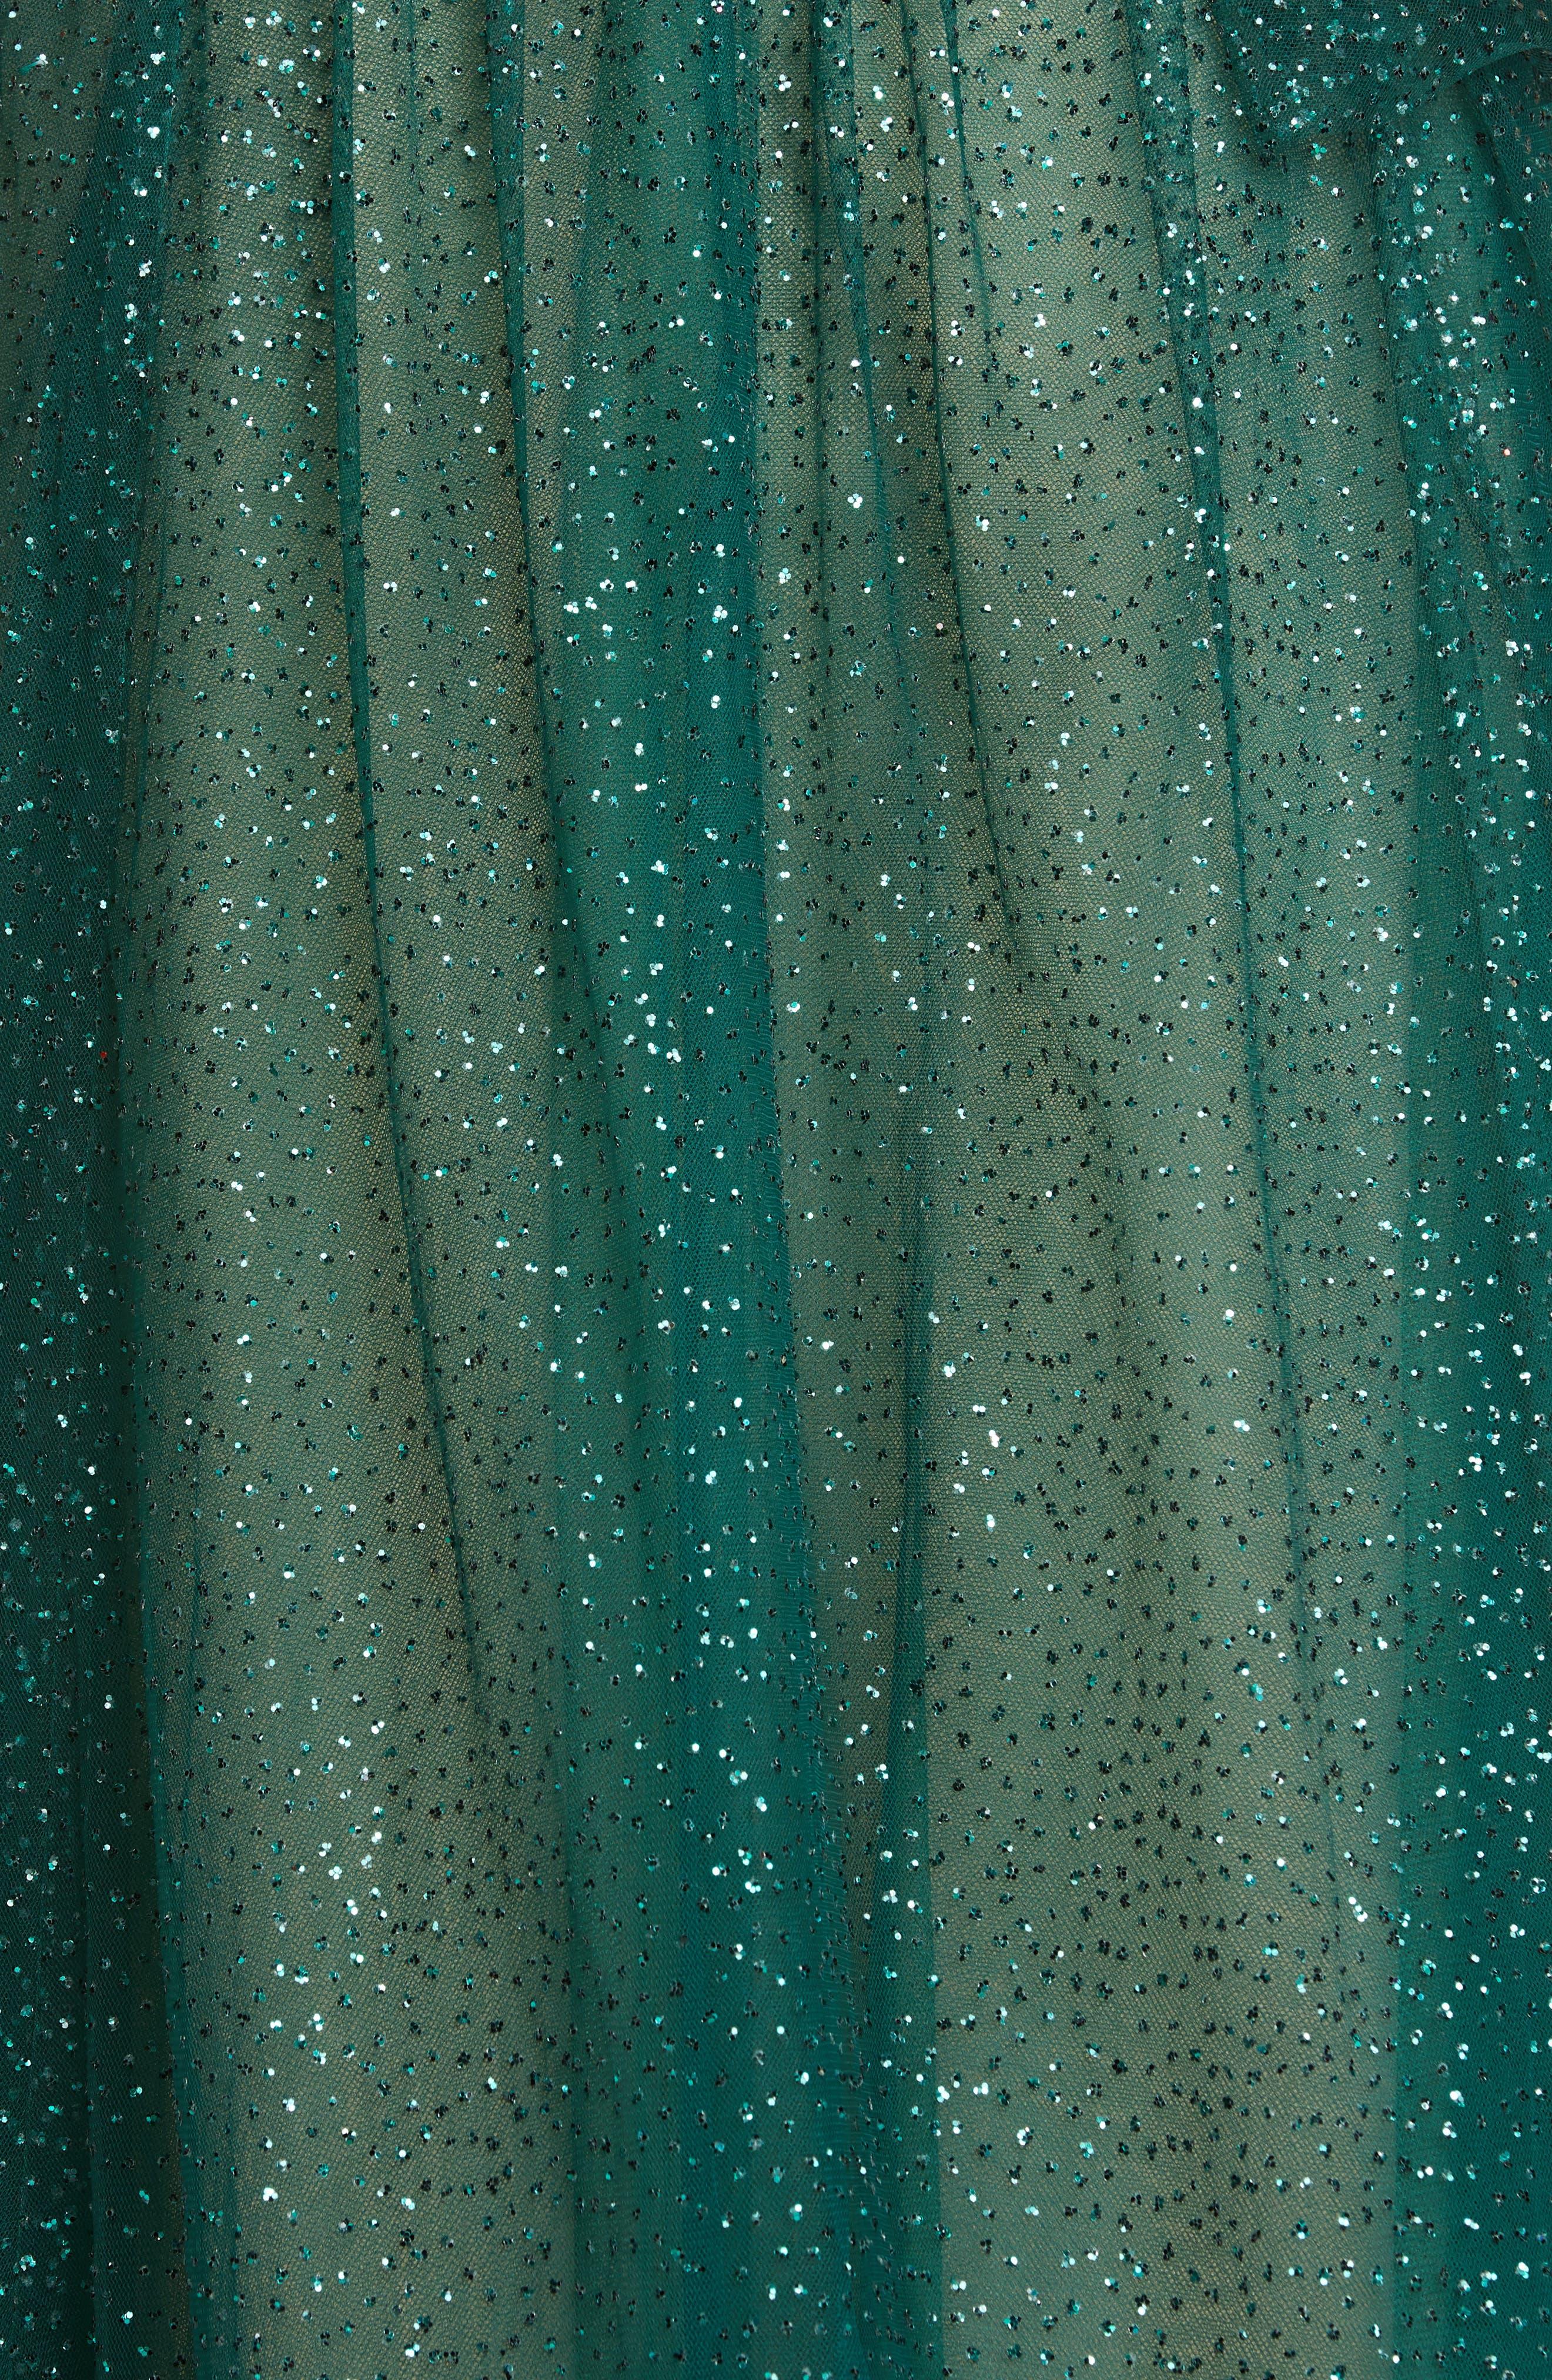 Marchesa Notte Dresses Glitter Tulle One-Shoulder Midi Dress